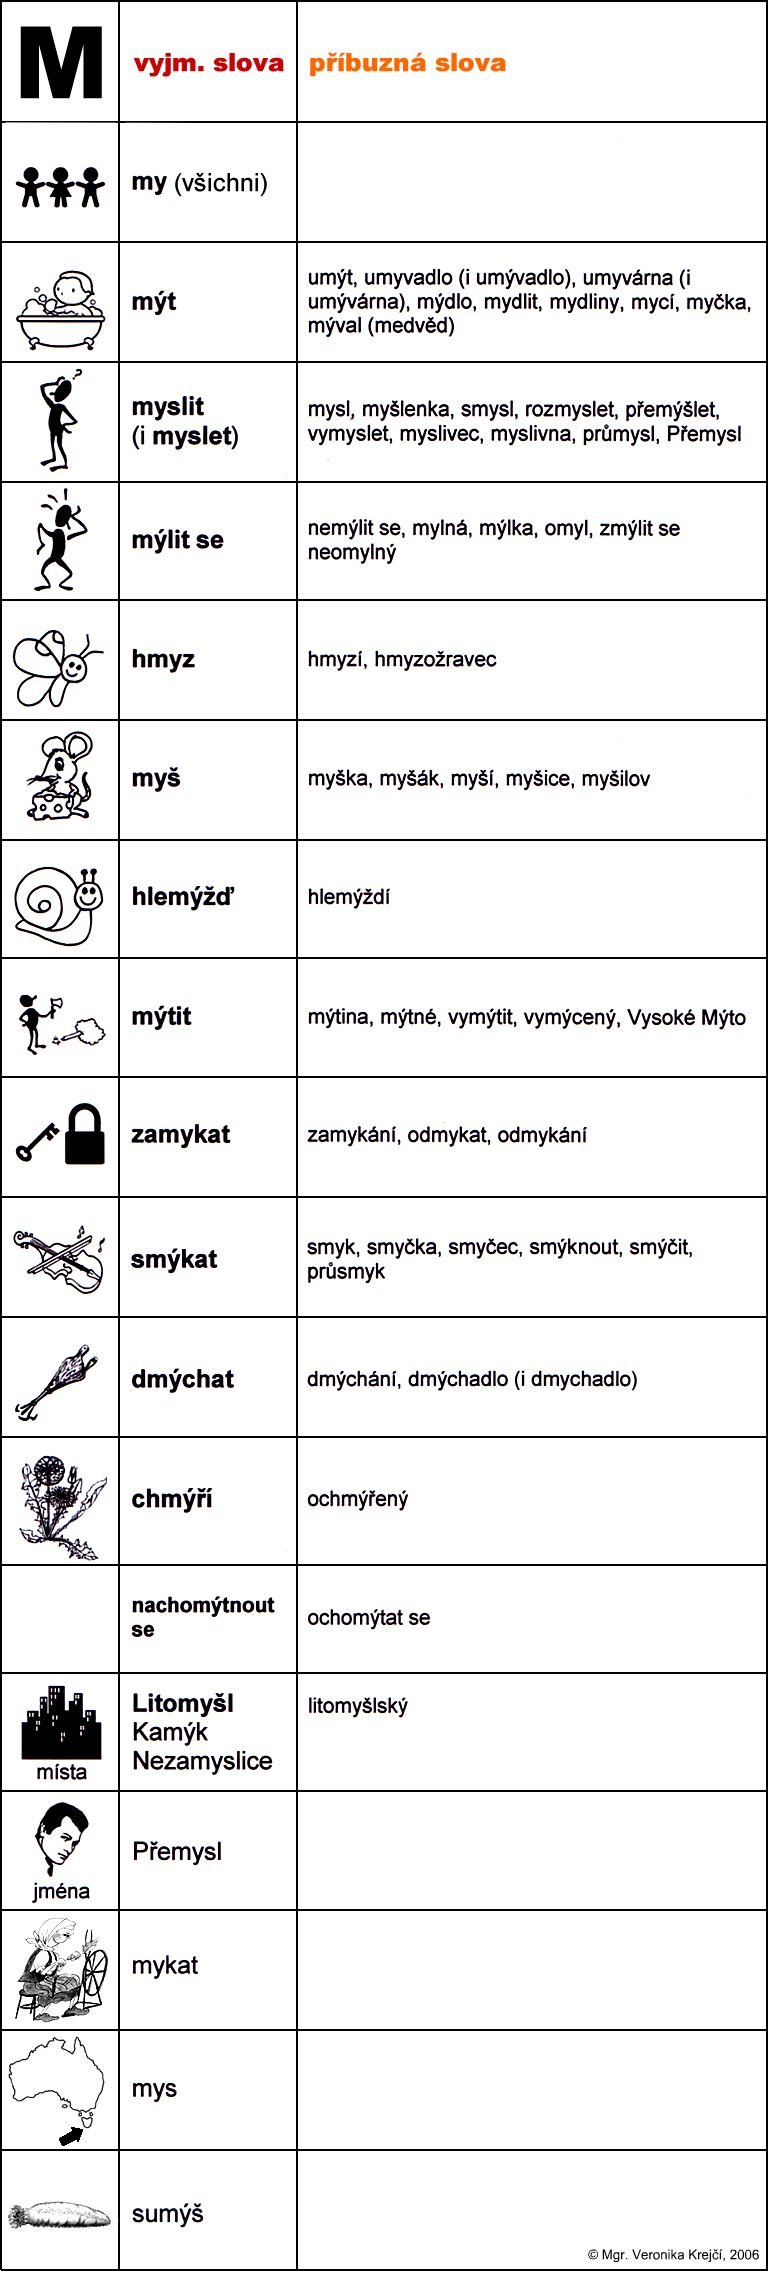 vyjm_slova-M.jpg (768×2271)